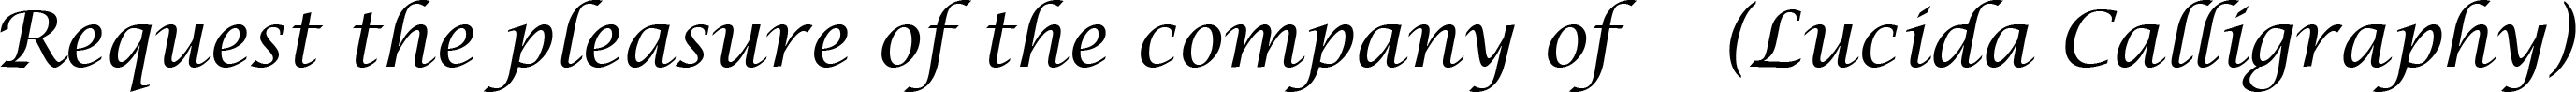 Lucida Calligraphy font